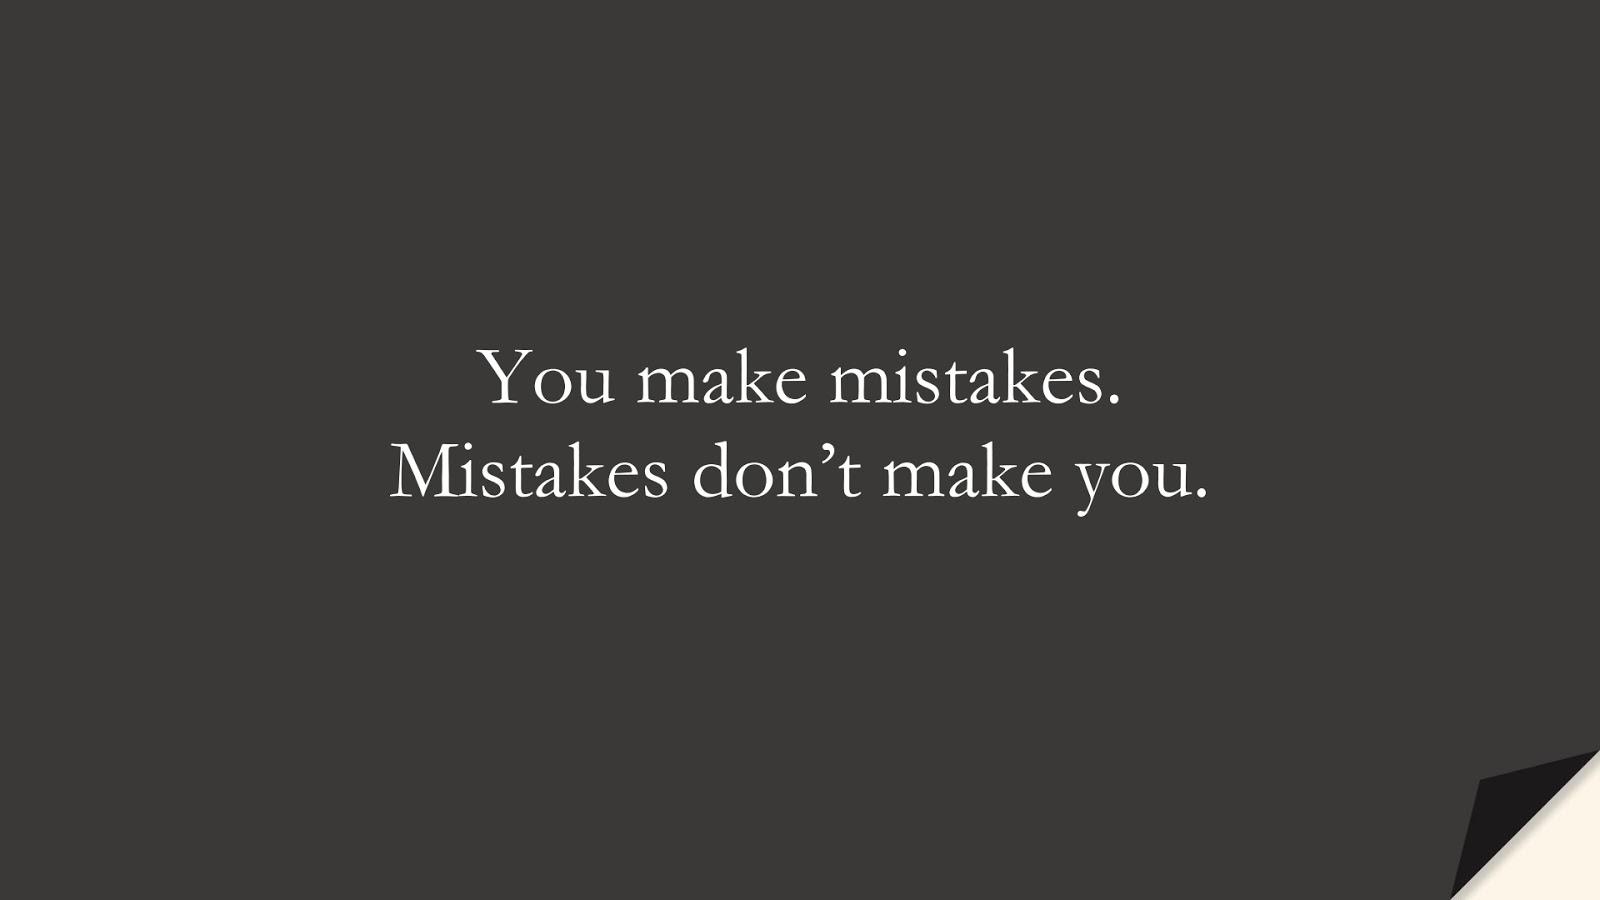 You make mistakes. Mistakes don't make you.FALSE